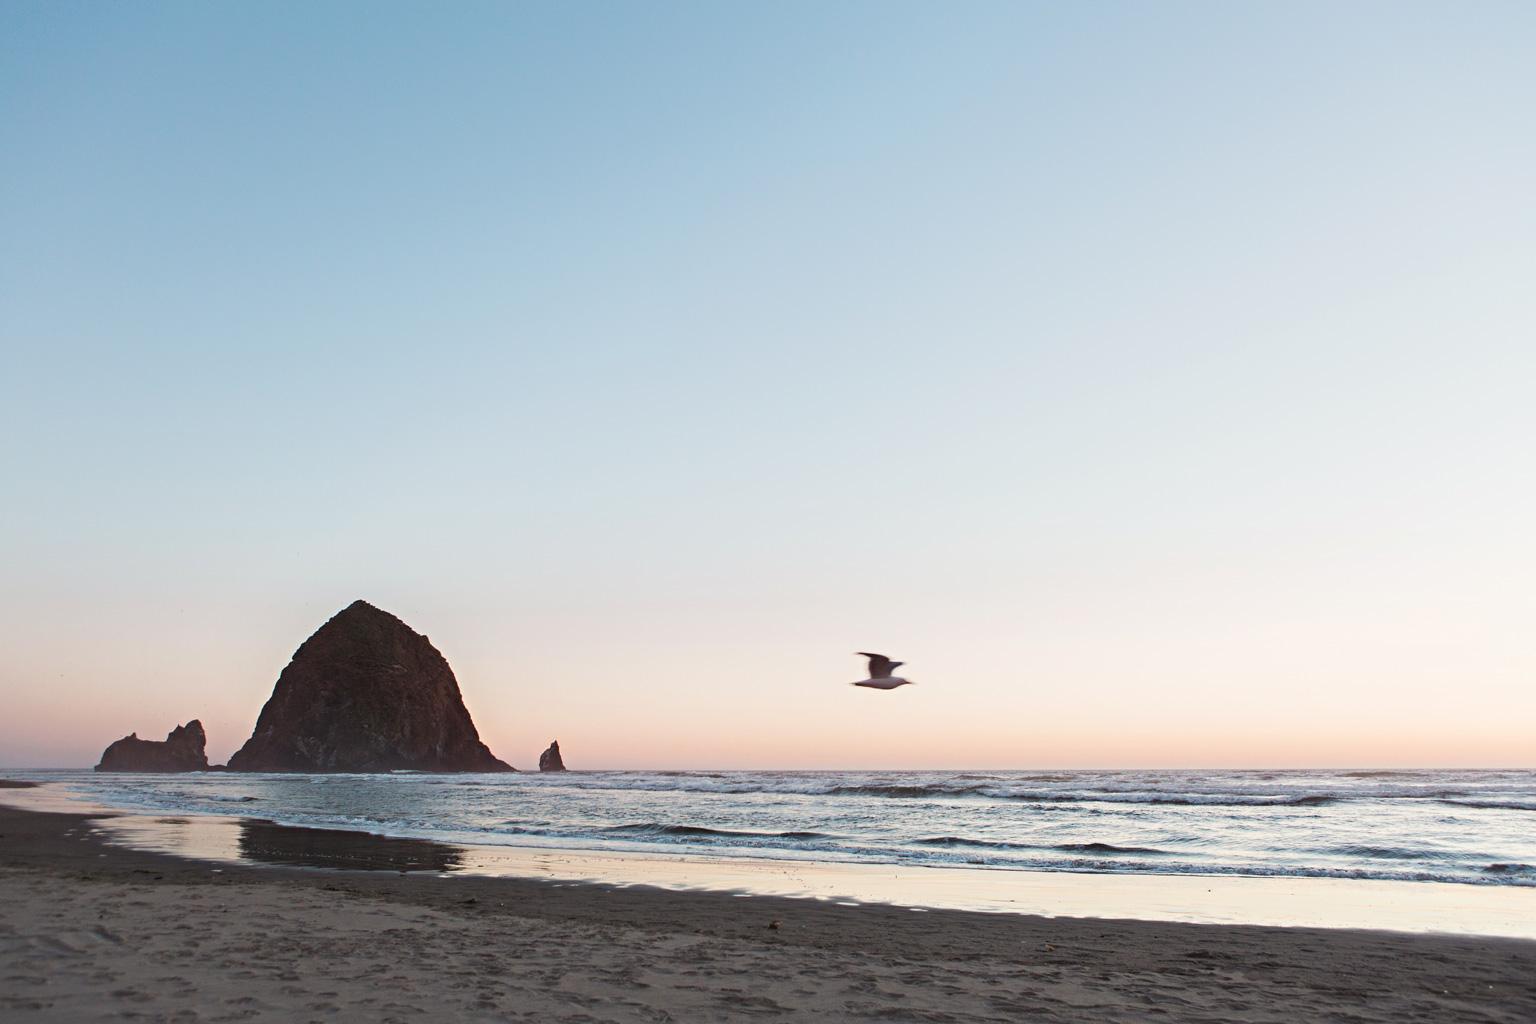 CindyGiovagnoli_Crater_Lake_National_Park_Cape_Perpetua_Heceta_Head_lighthouse_Pacific_Ocean_Cannon_Beach_haystack_Oregon_coast-004.jpg